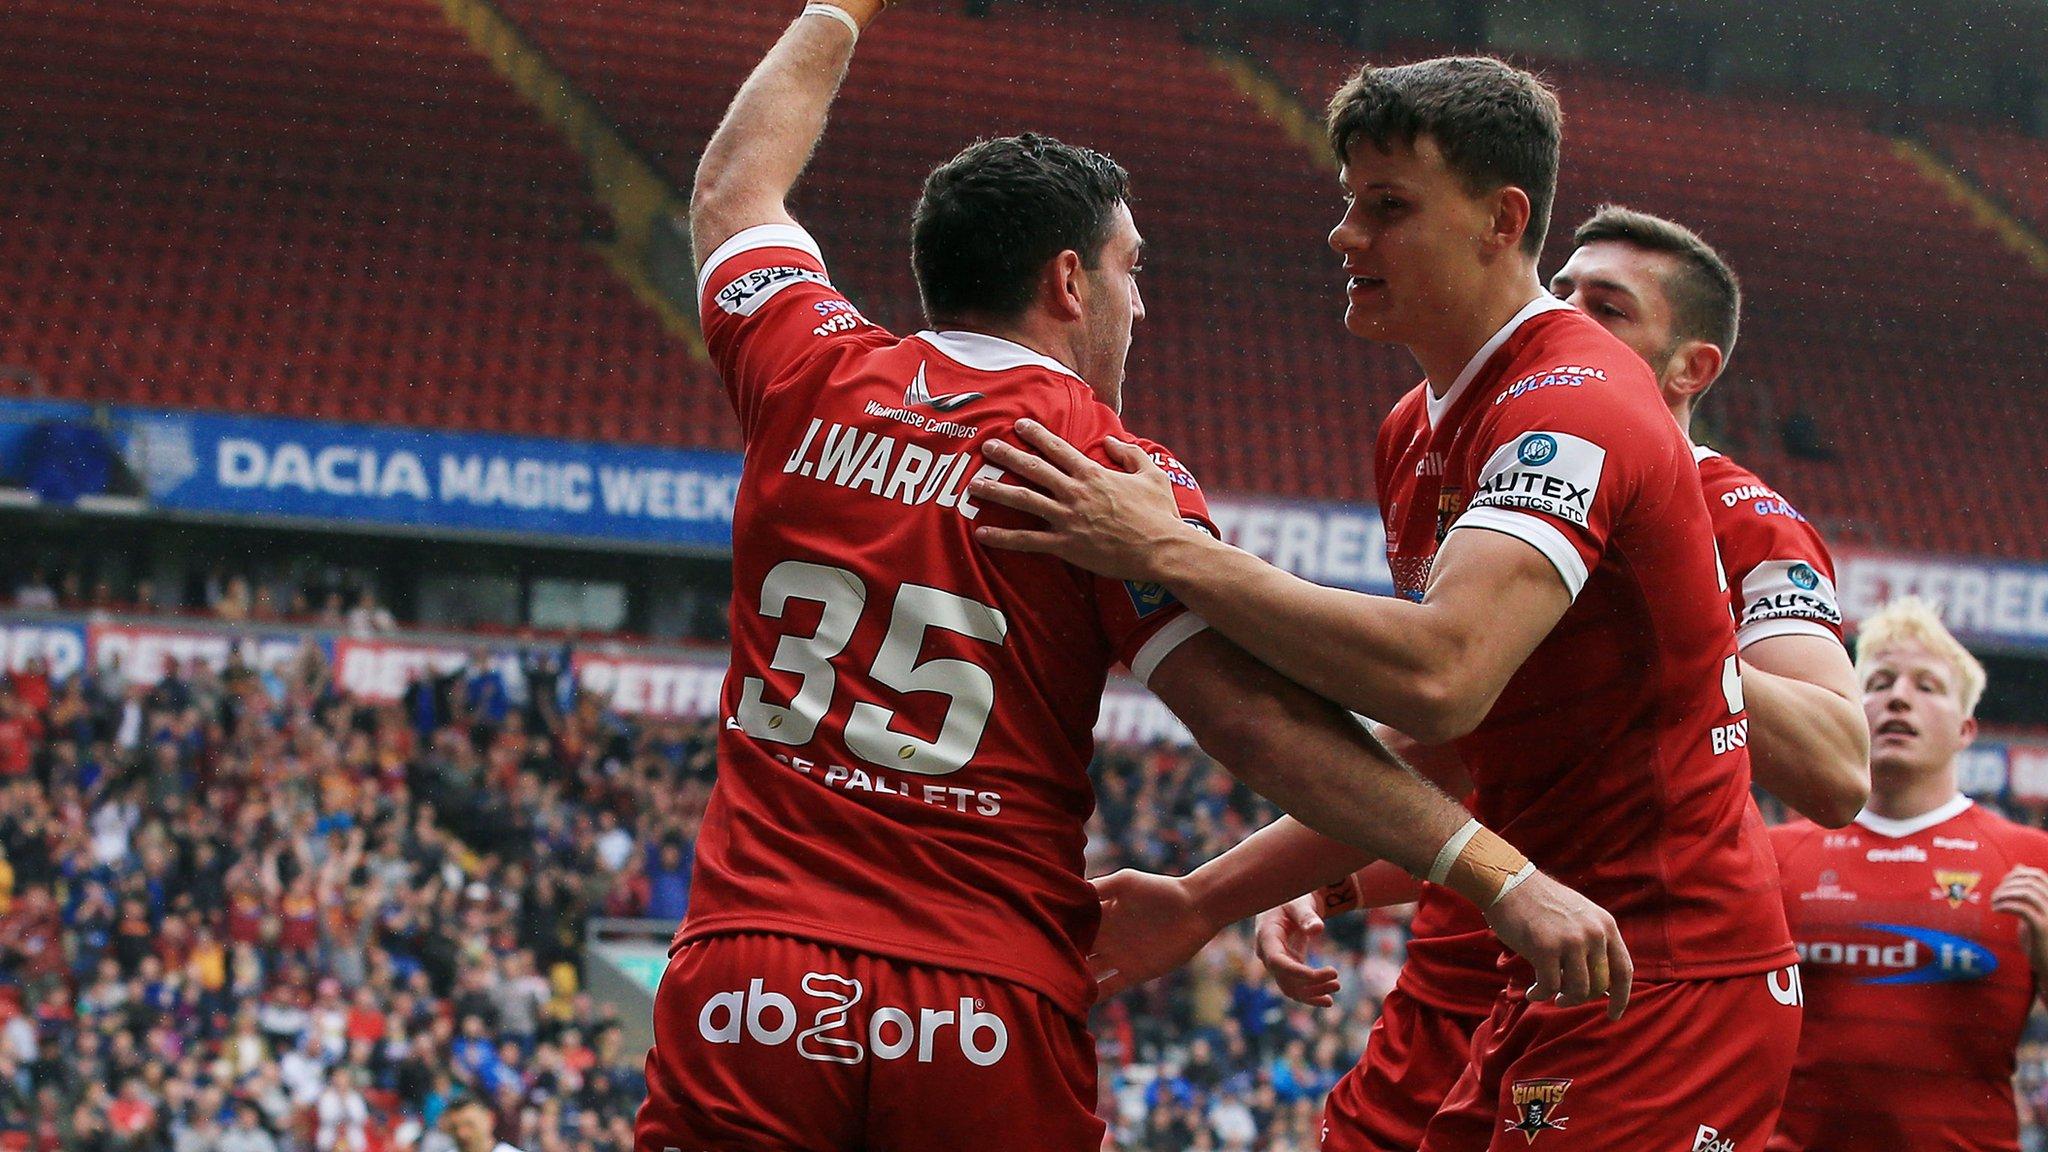 Super League: Huddersfield Giants thrash Hull FC at Magic Weekend